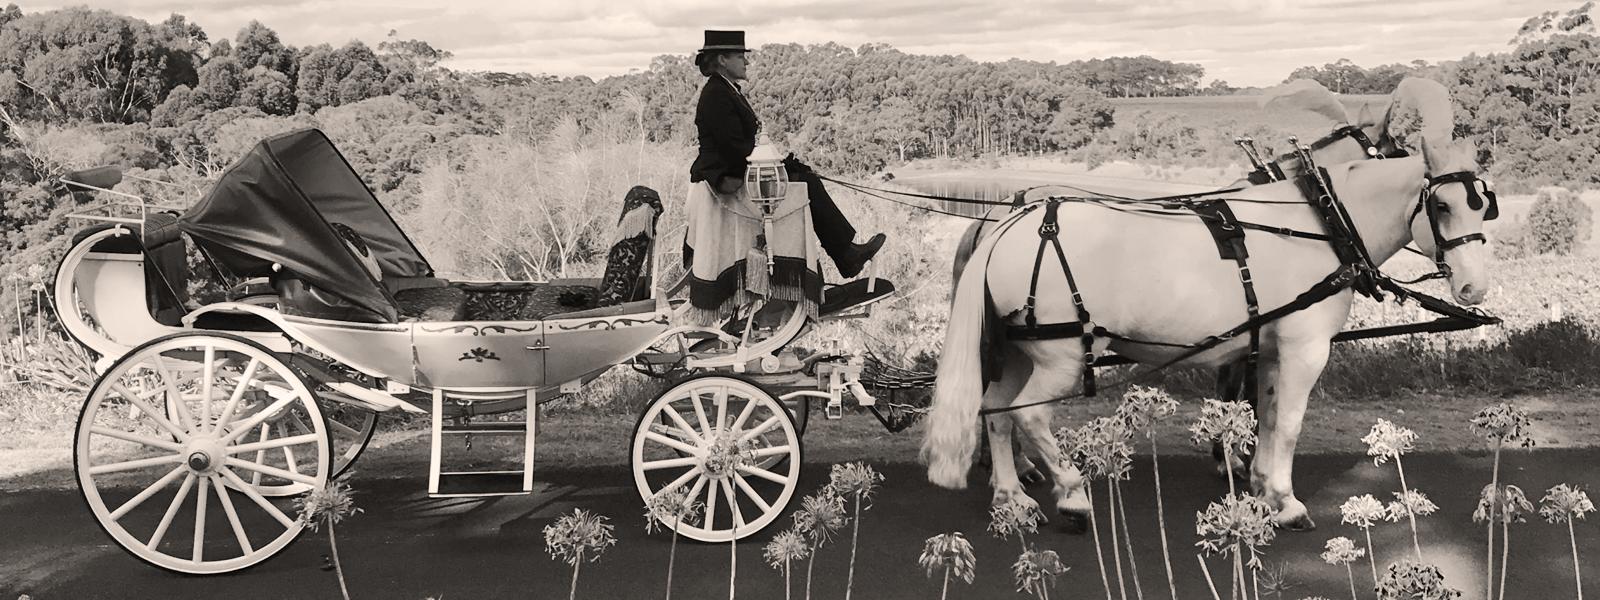 Perth-Horse-&-Carriage-Roadside